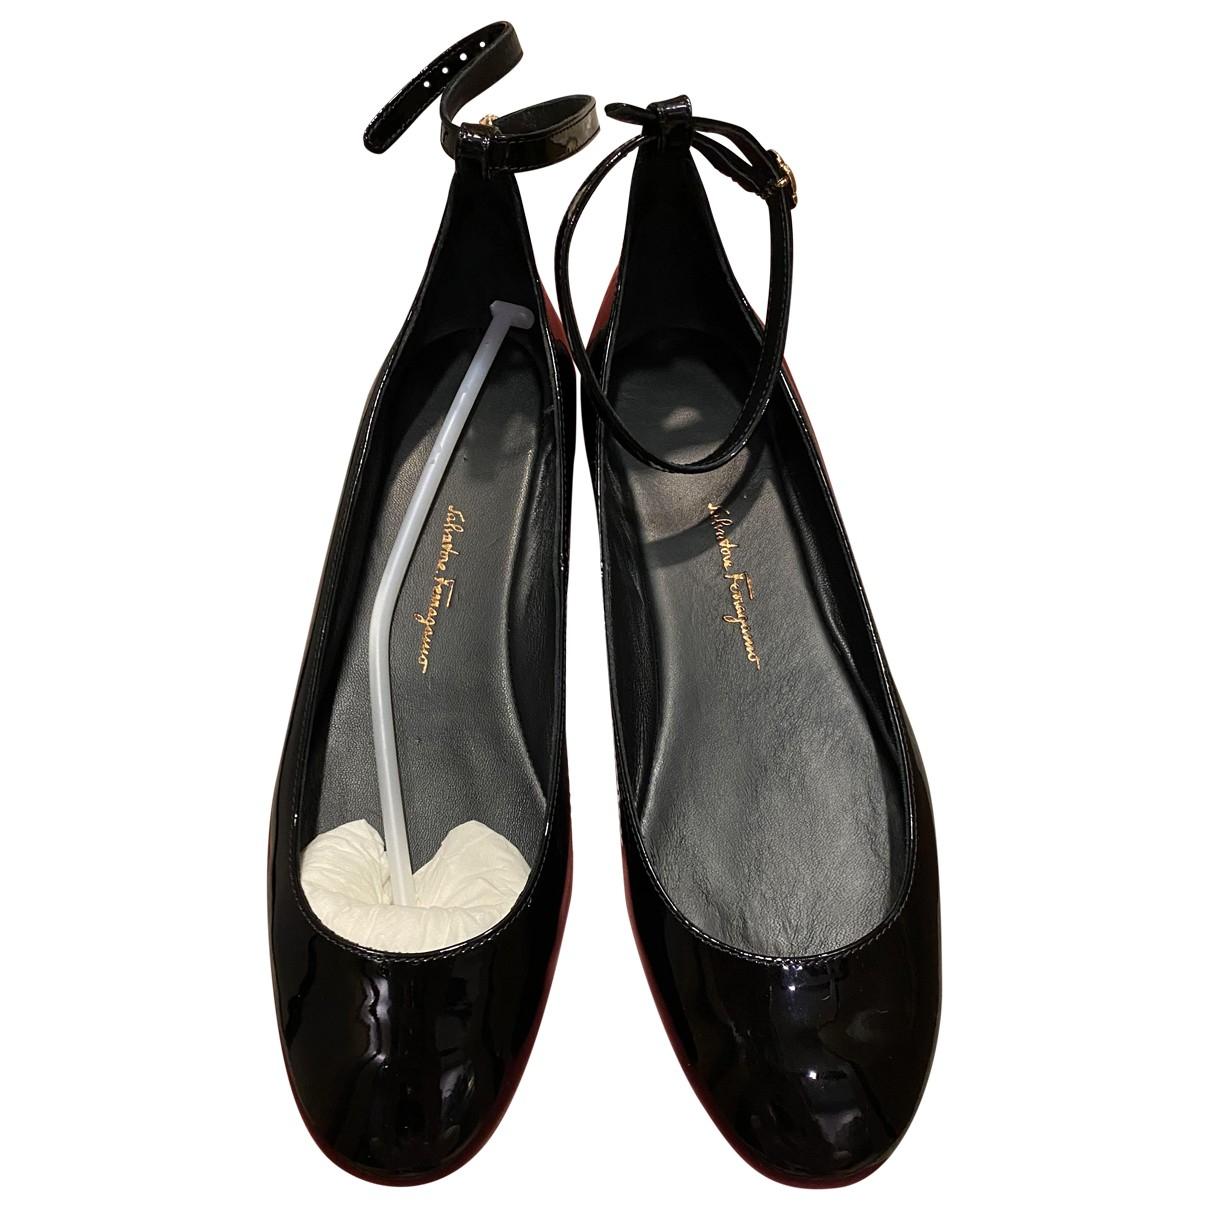 Salvatore Ferragamo \N Black Patent leather Ballet flats for Women 35.5 EU